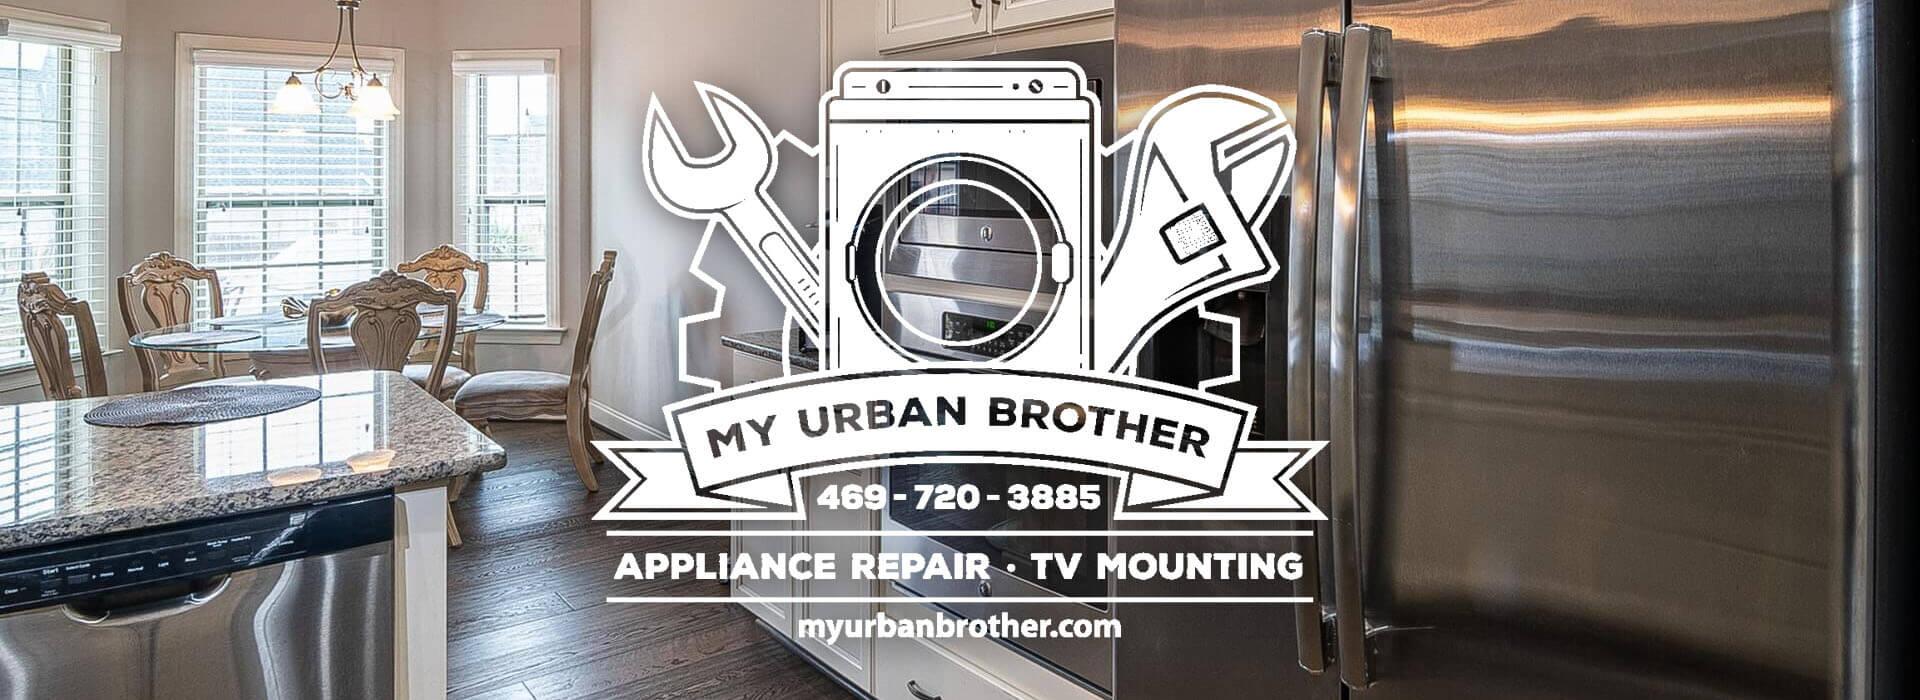 Urban Brothers header